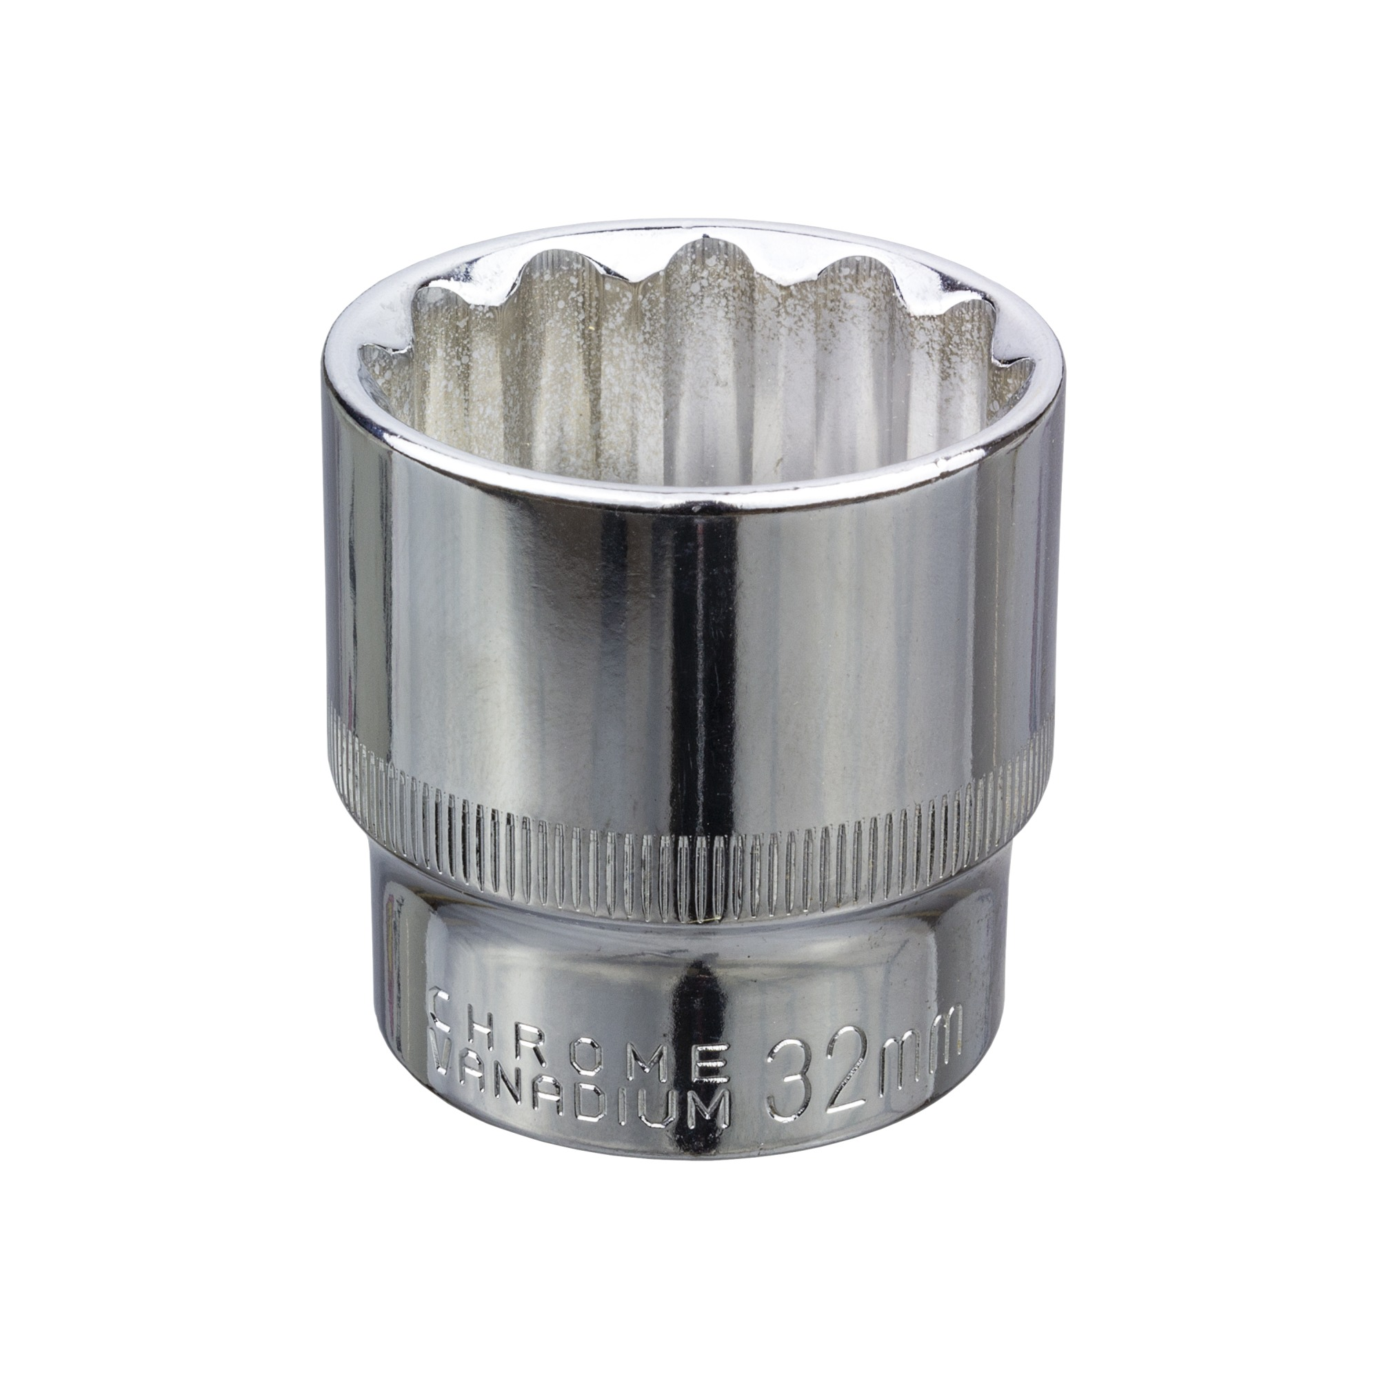 Soquete Estriado 12 32 mm - Startools